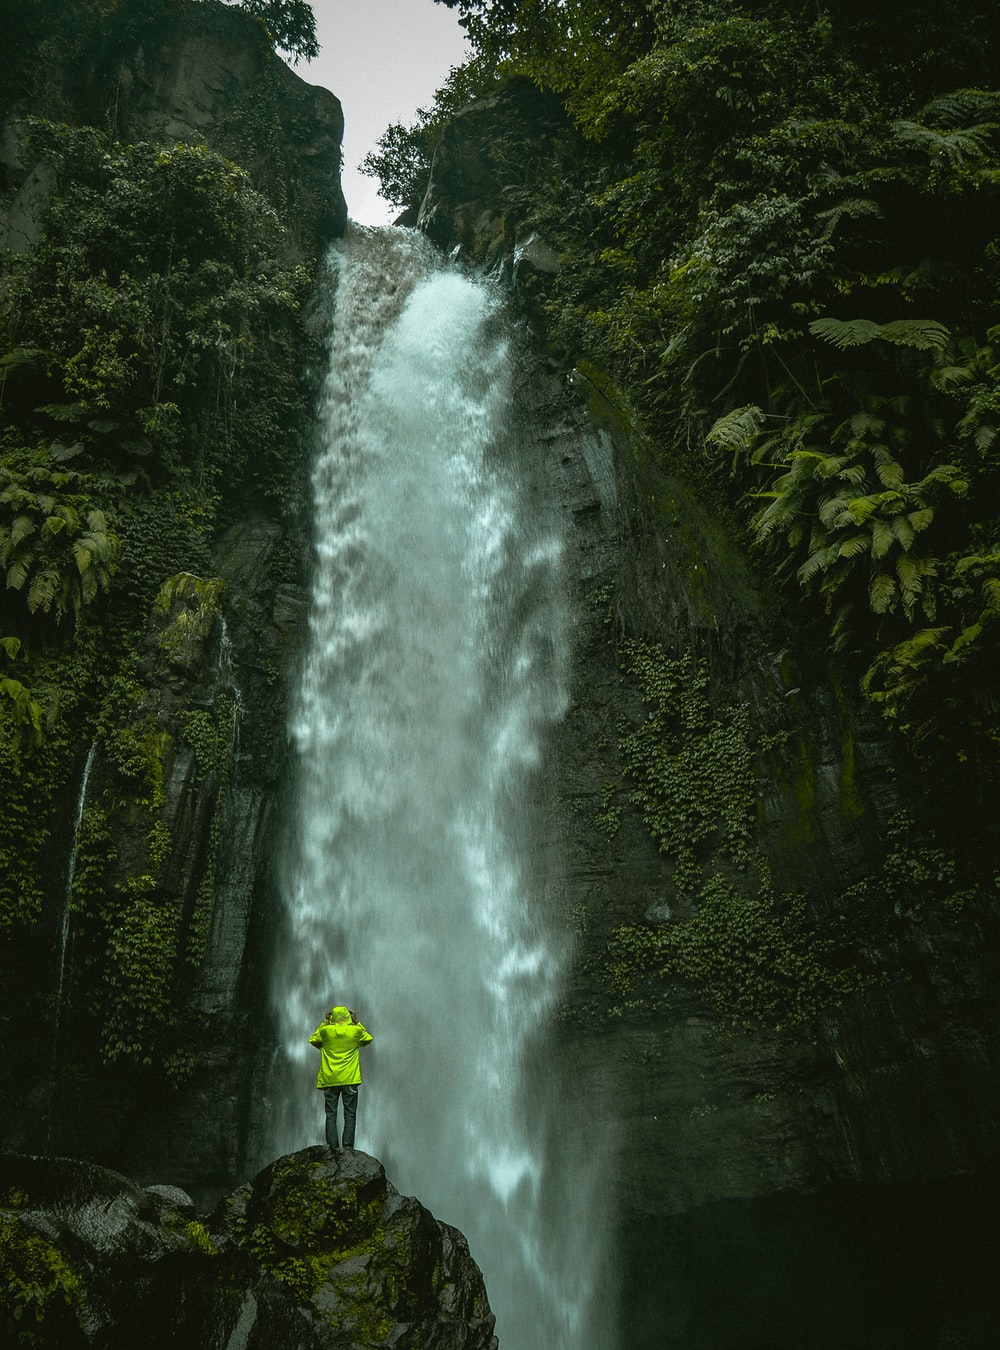 man standing on rock infront of waterfalls